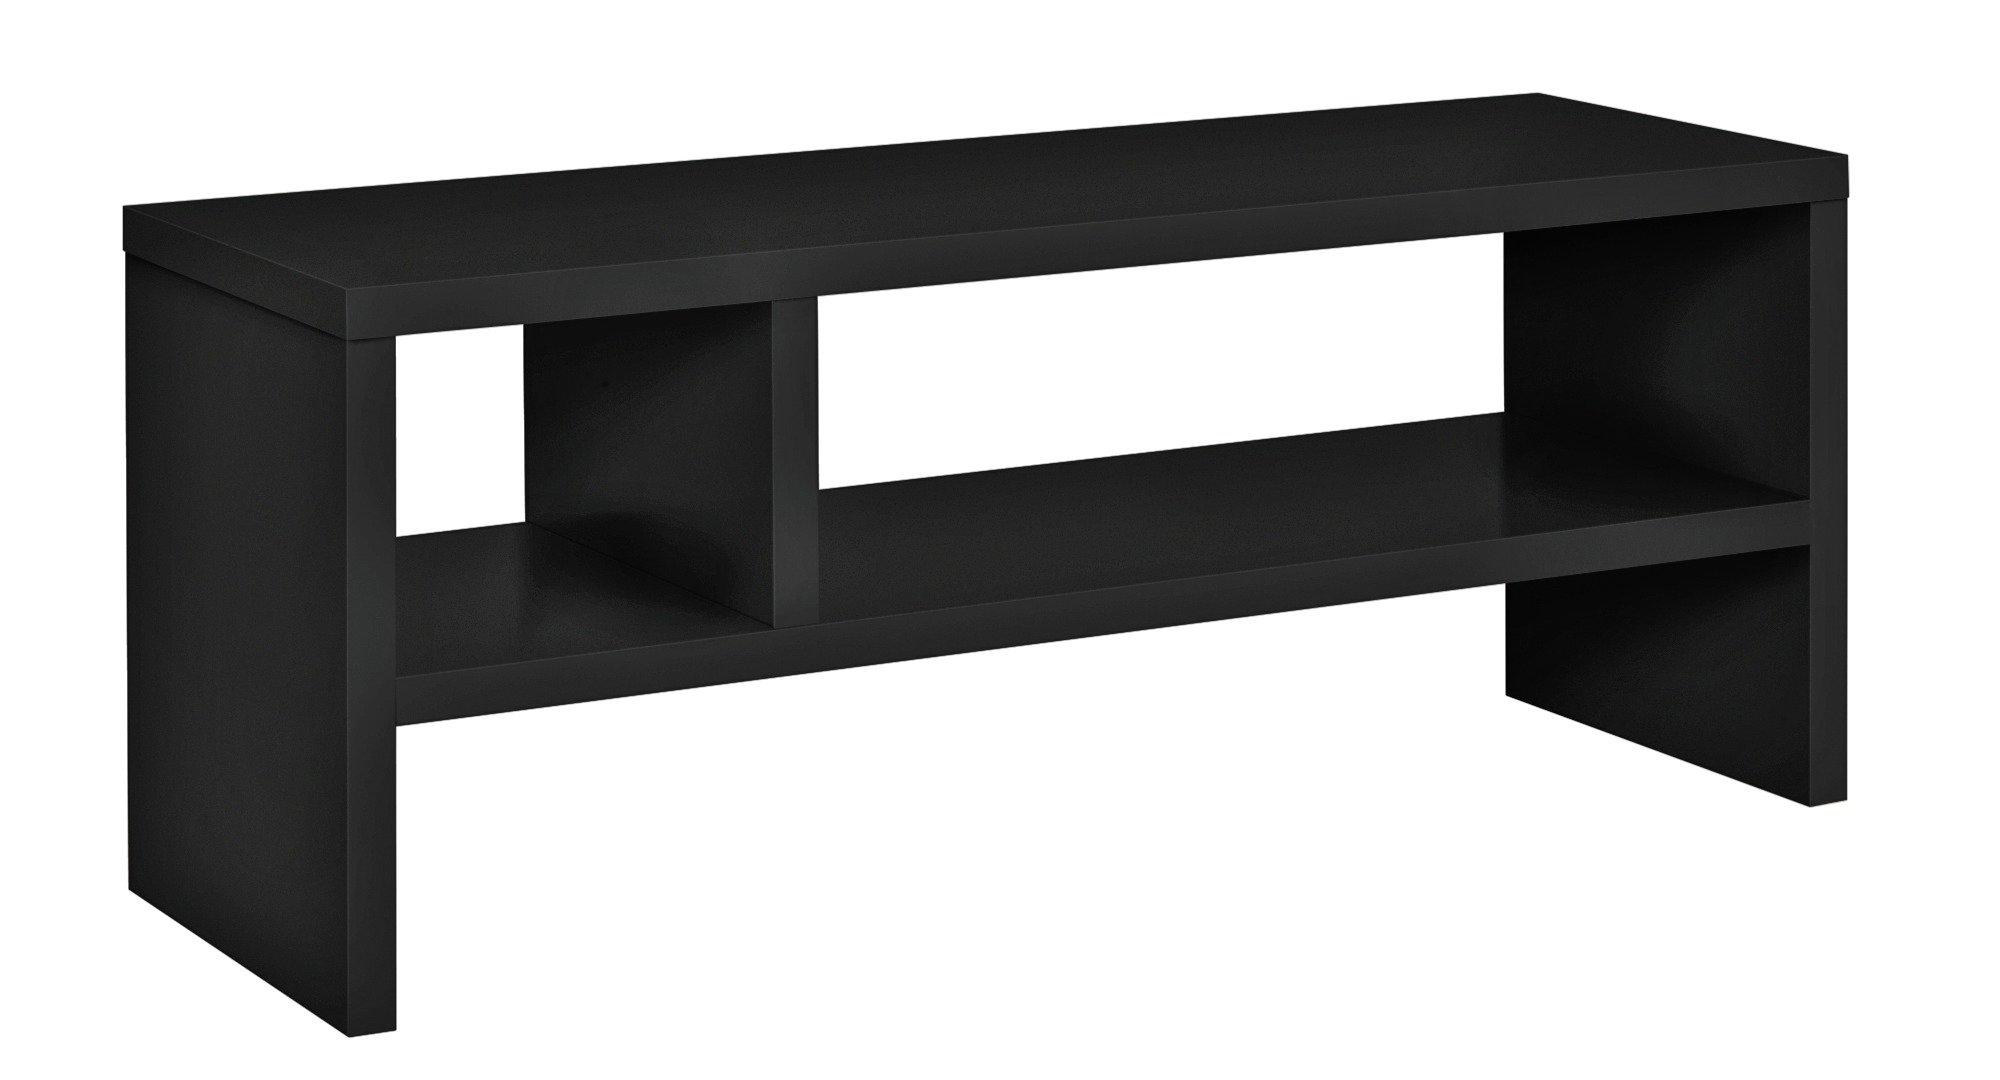 Argos Home Oscar TV Unit - Black